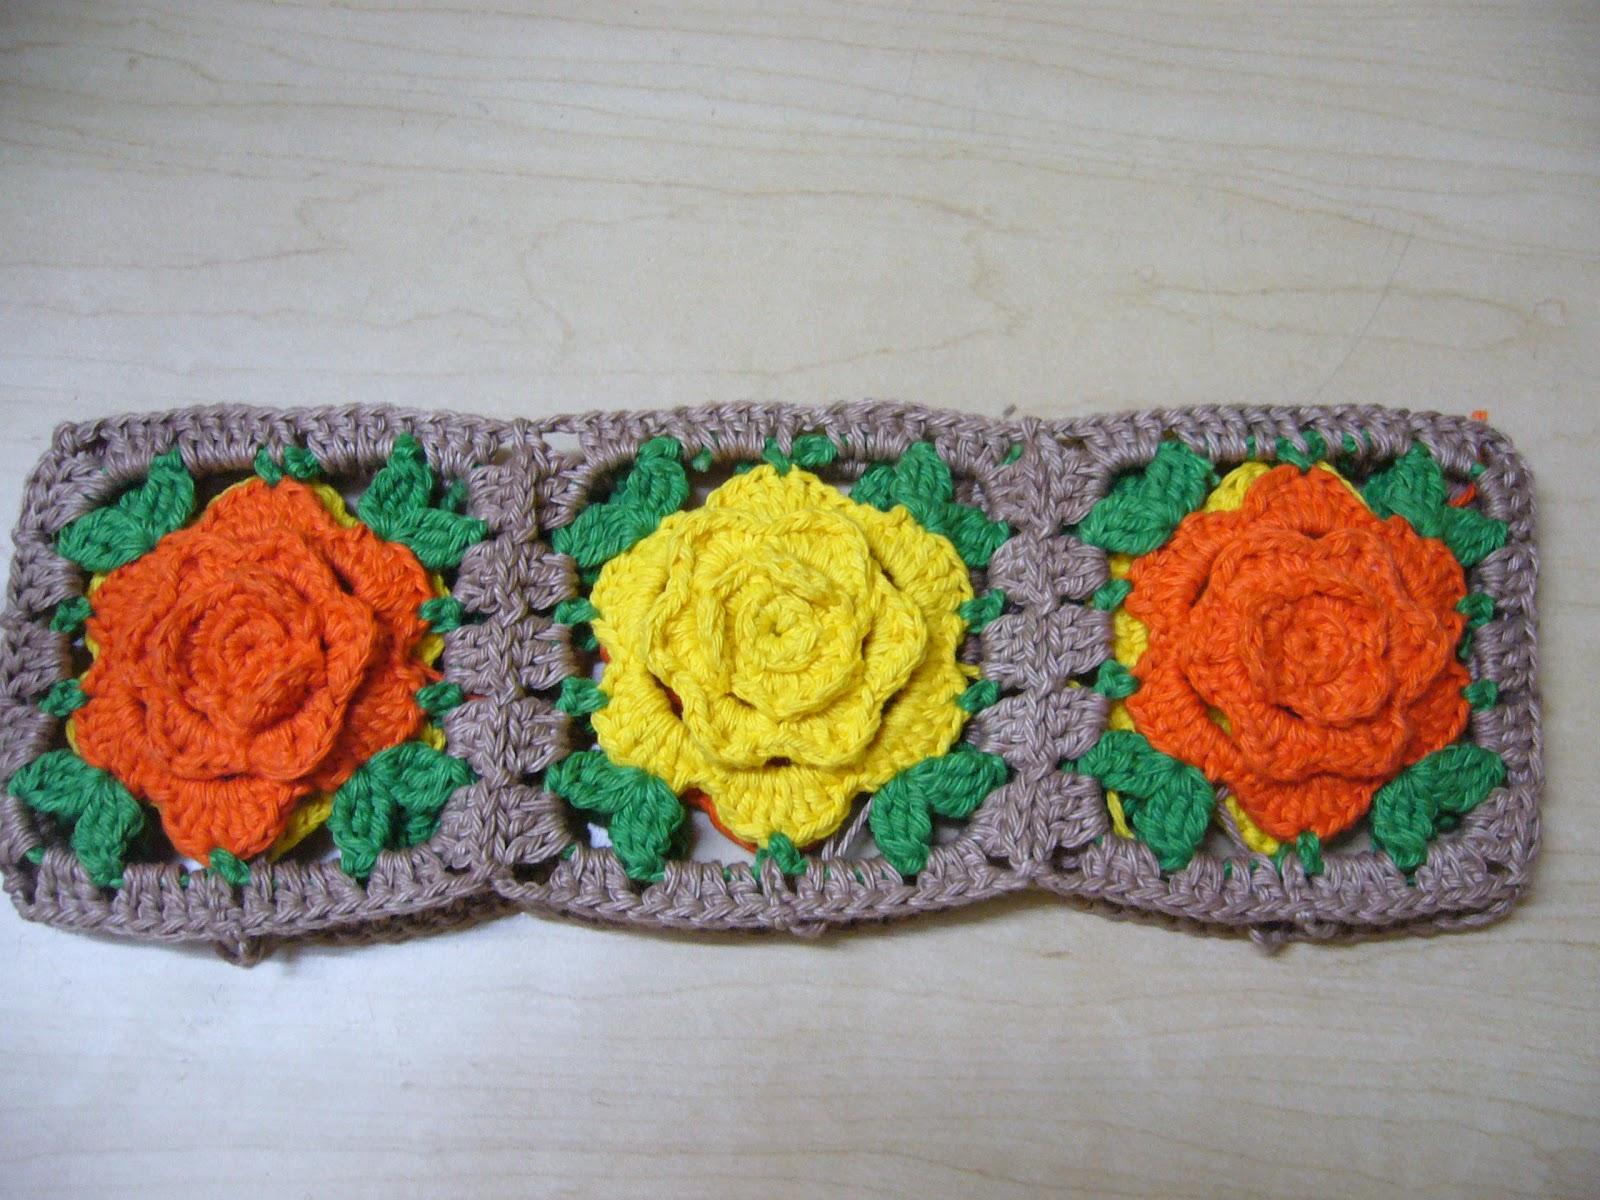 Crochet Rose Pattern Granny Square : Crochetkari: Crochet Rose Basket